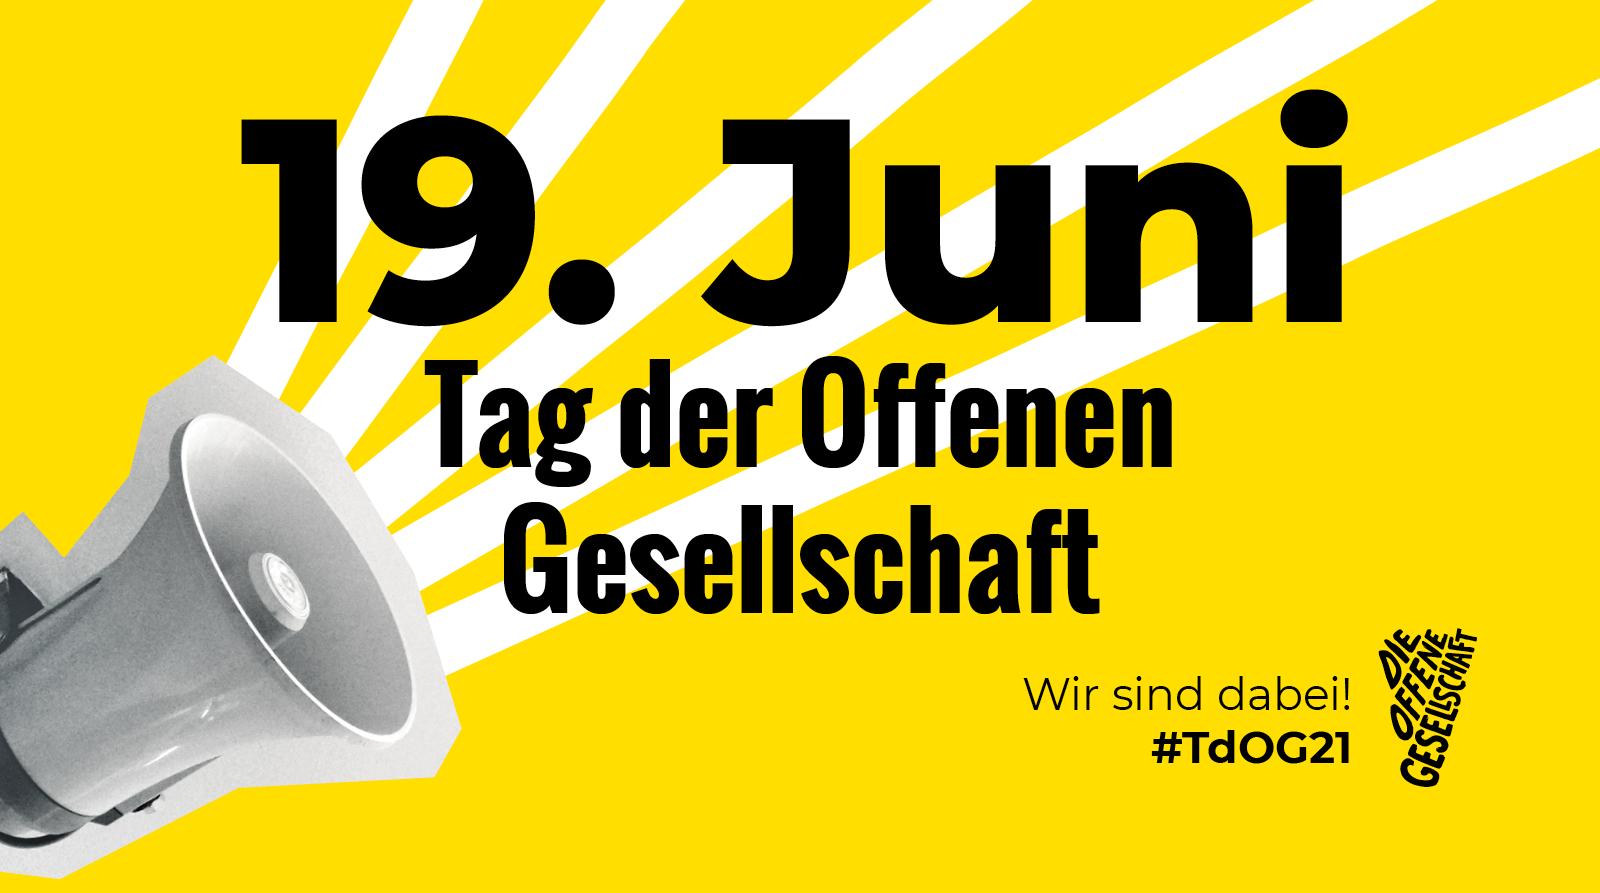 #TdOG Horizont 19 Juni